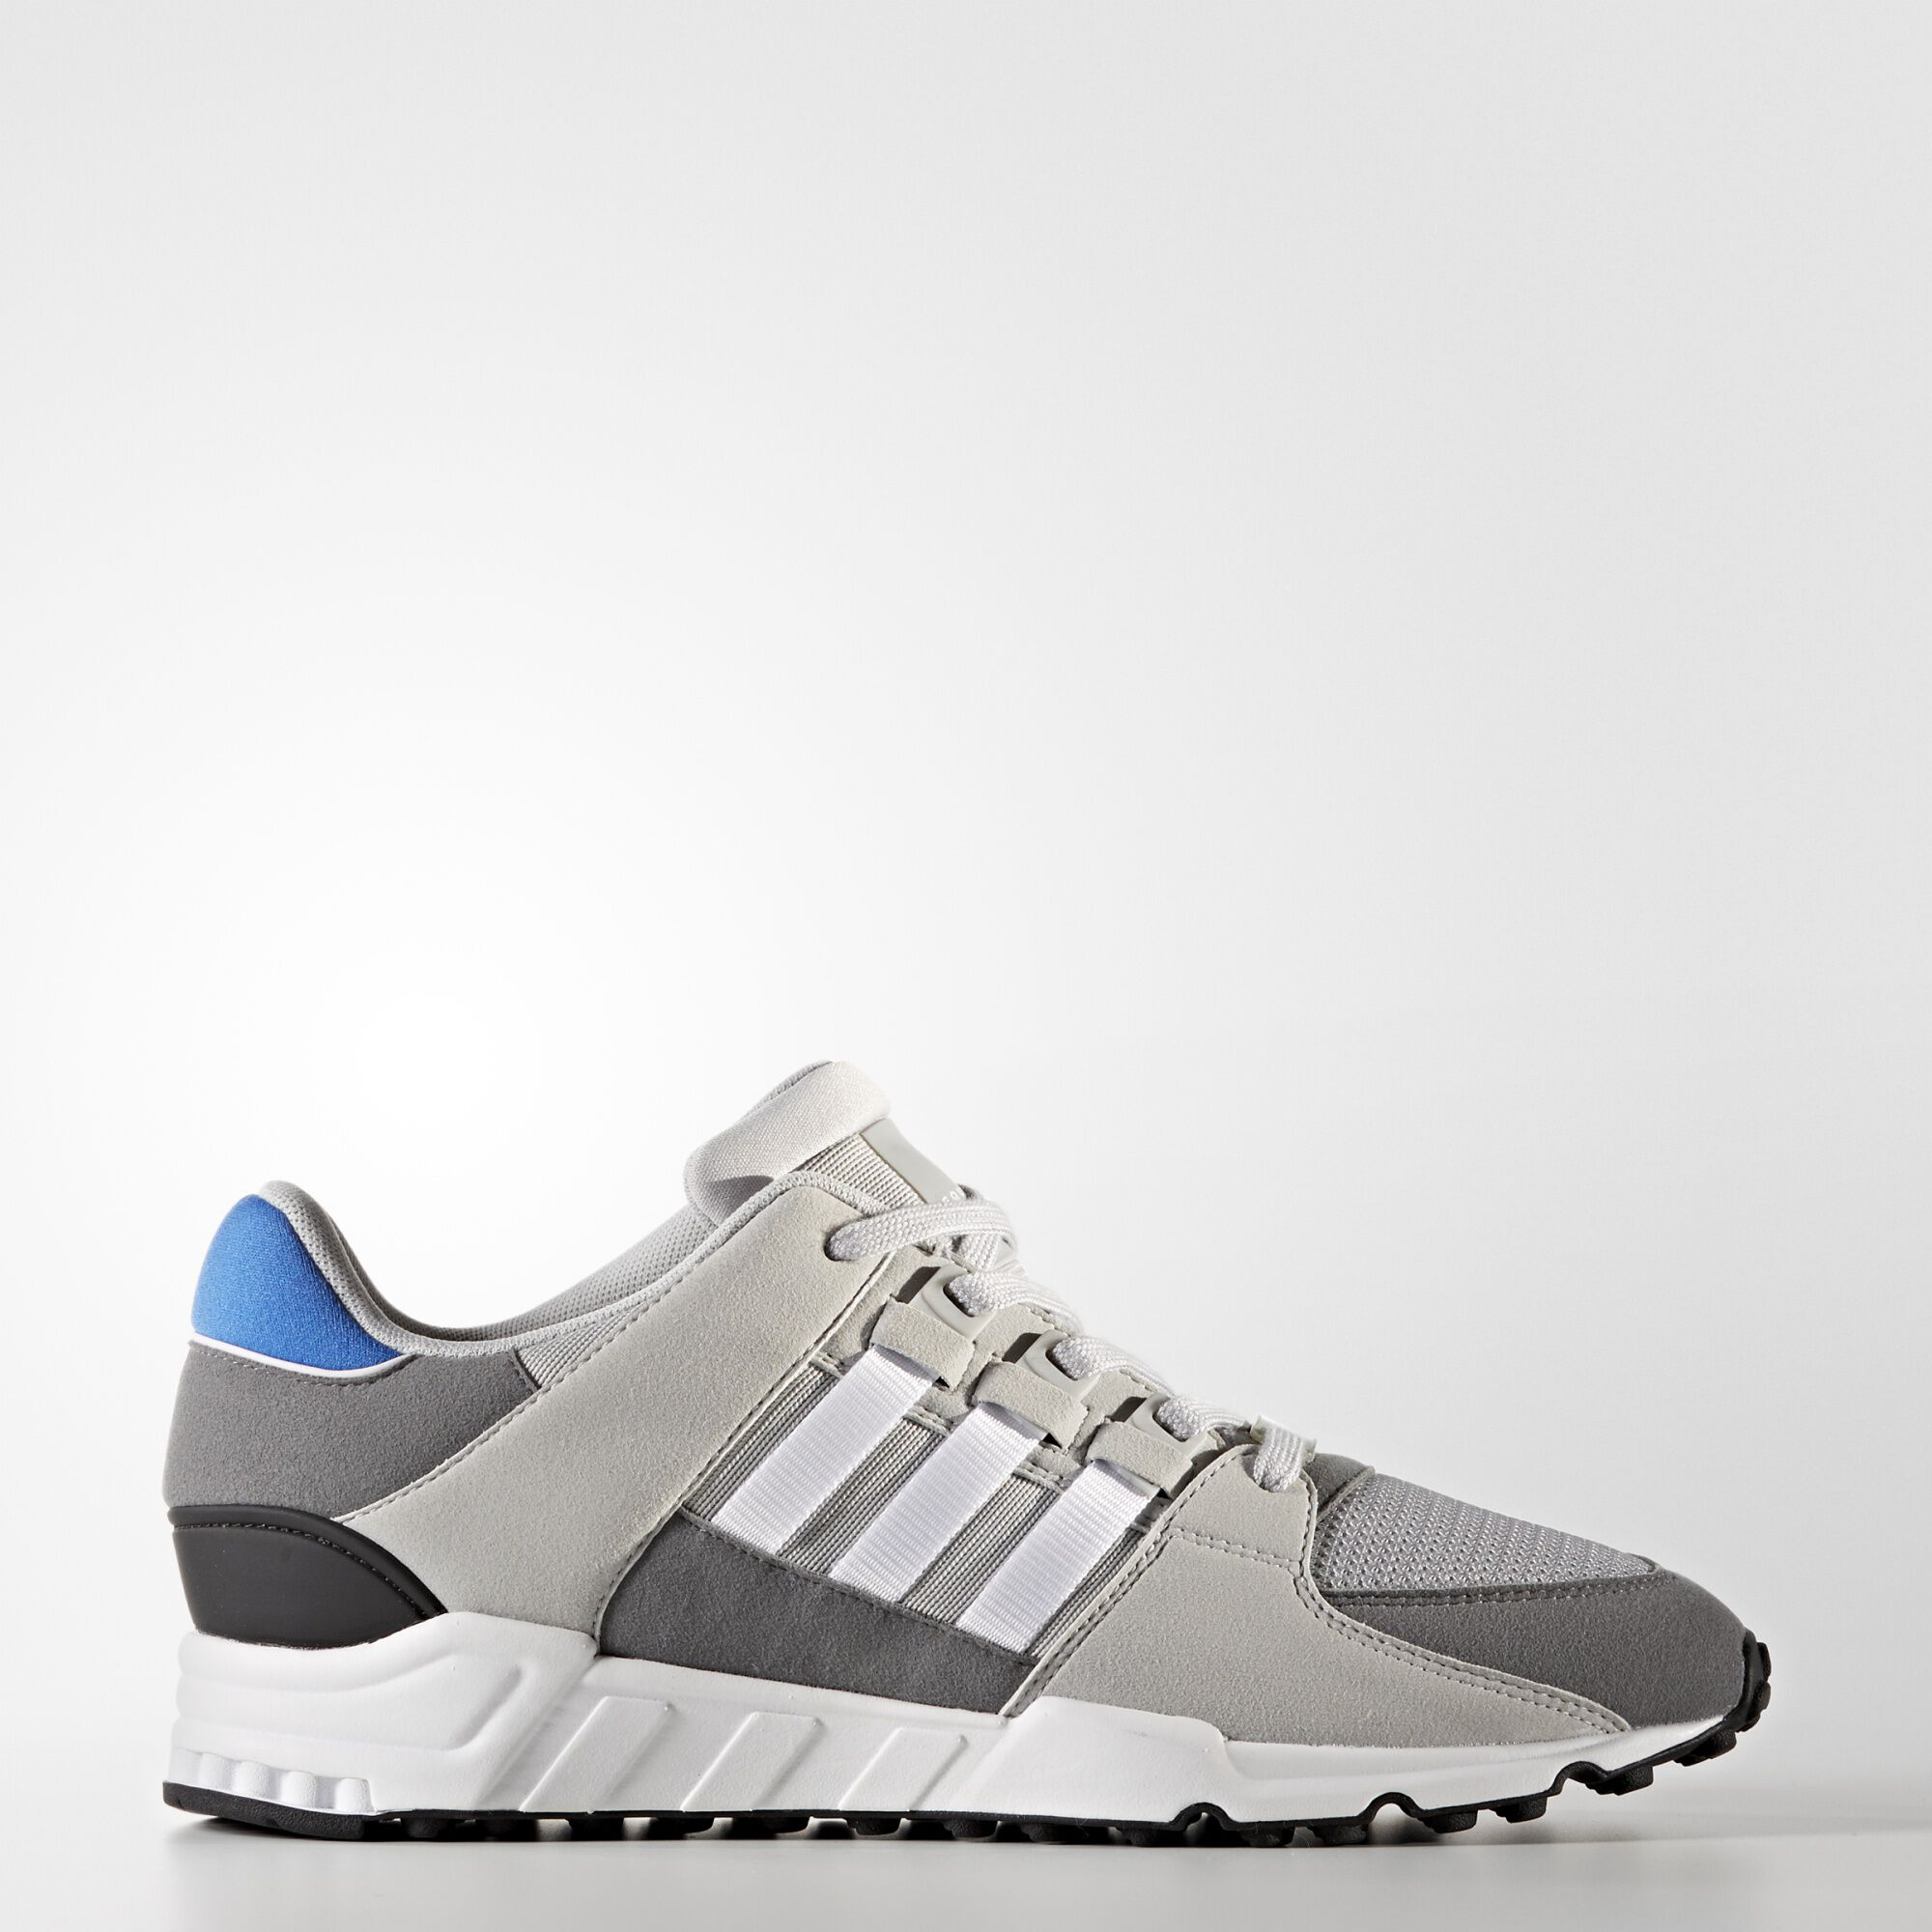 chaussure eqt support rf,Adidas Chaussure EQT Support RF